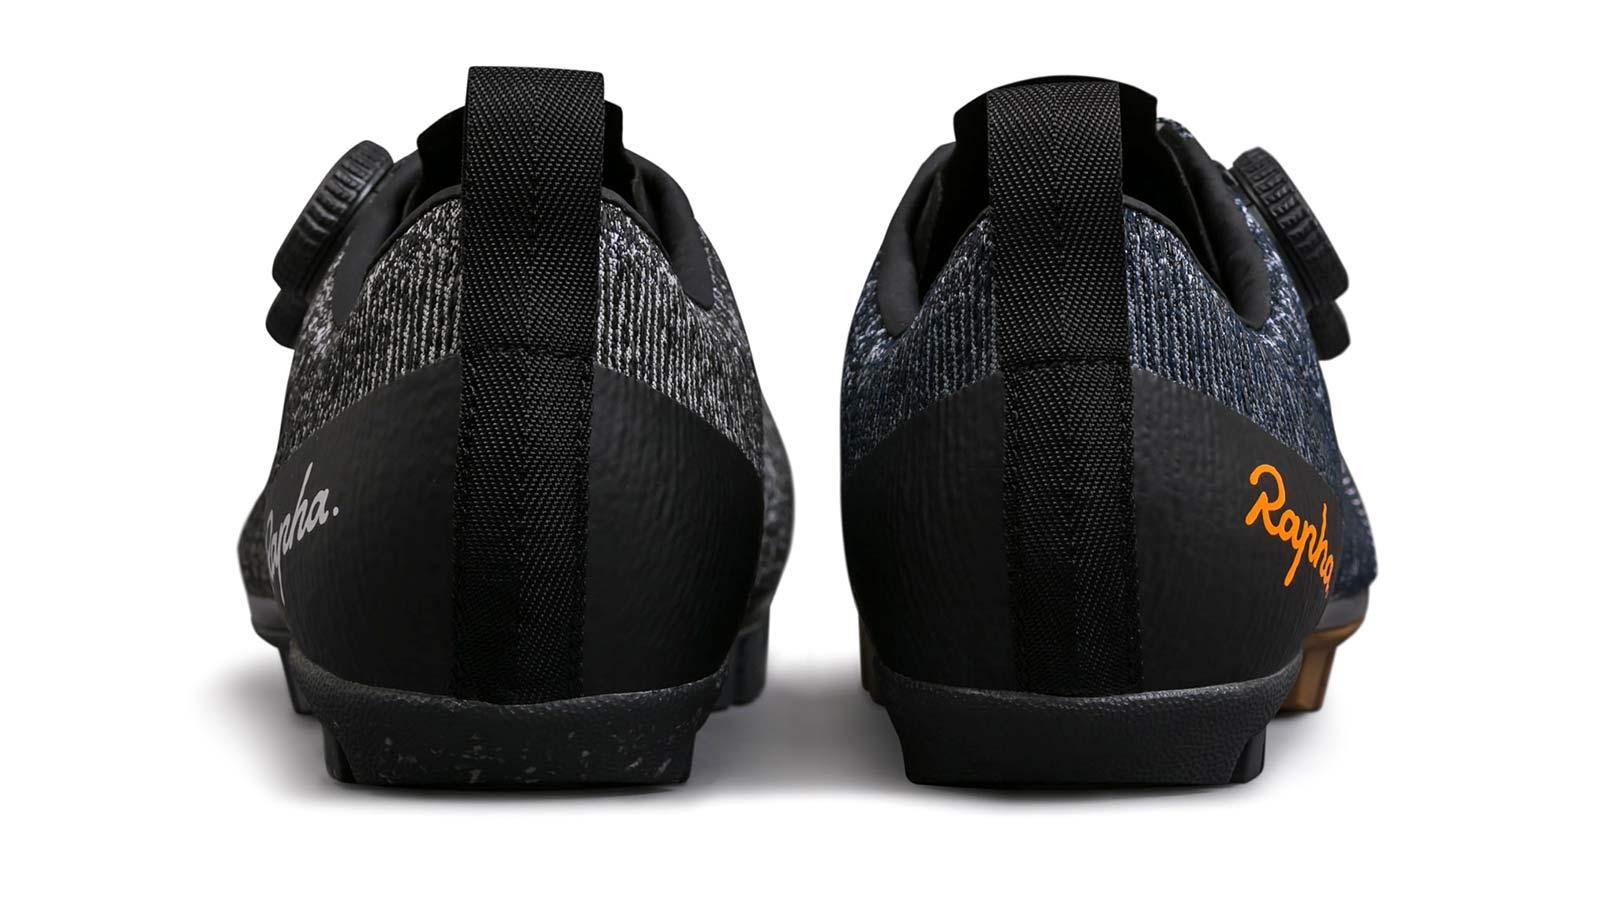 Rapha Explore Powerweave carbon-soled gravel bike shoes,heel rear view